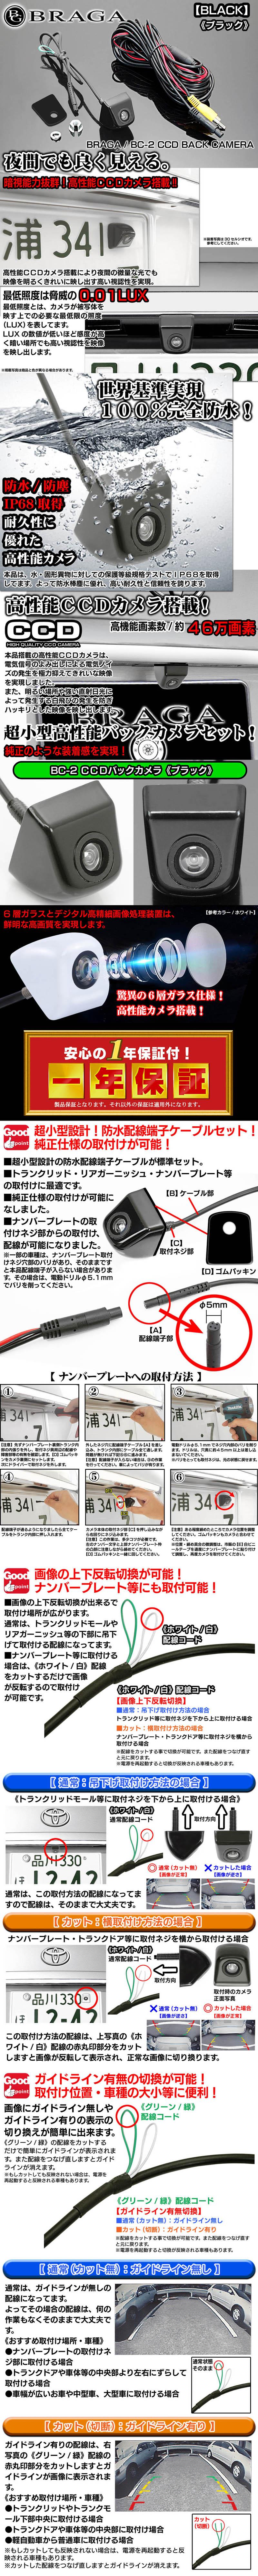 BC-2【ブラック】超小型バックカメラ/高画質CCDカメラ搭載46万画素/純正取付仕様/ガイドライン有無切換式/広角170°防水防塵IP68/12V専用/1年保証《BRAGA/ブラガ》